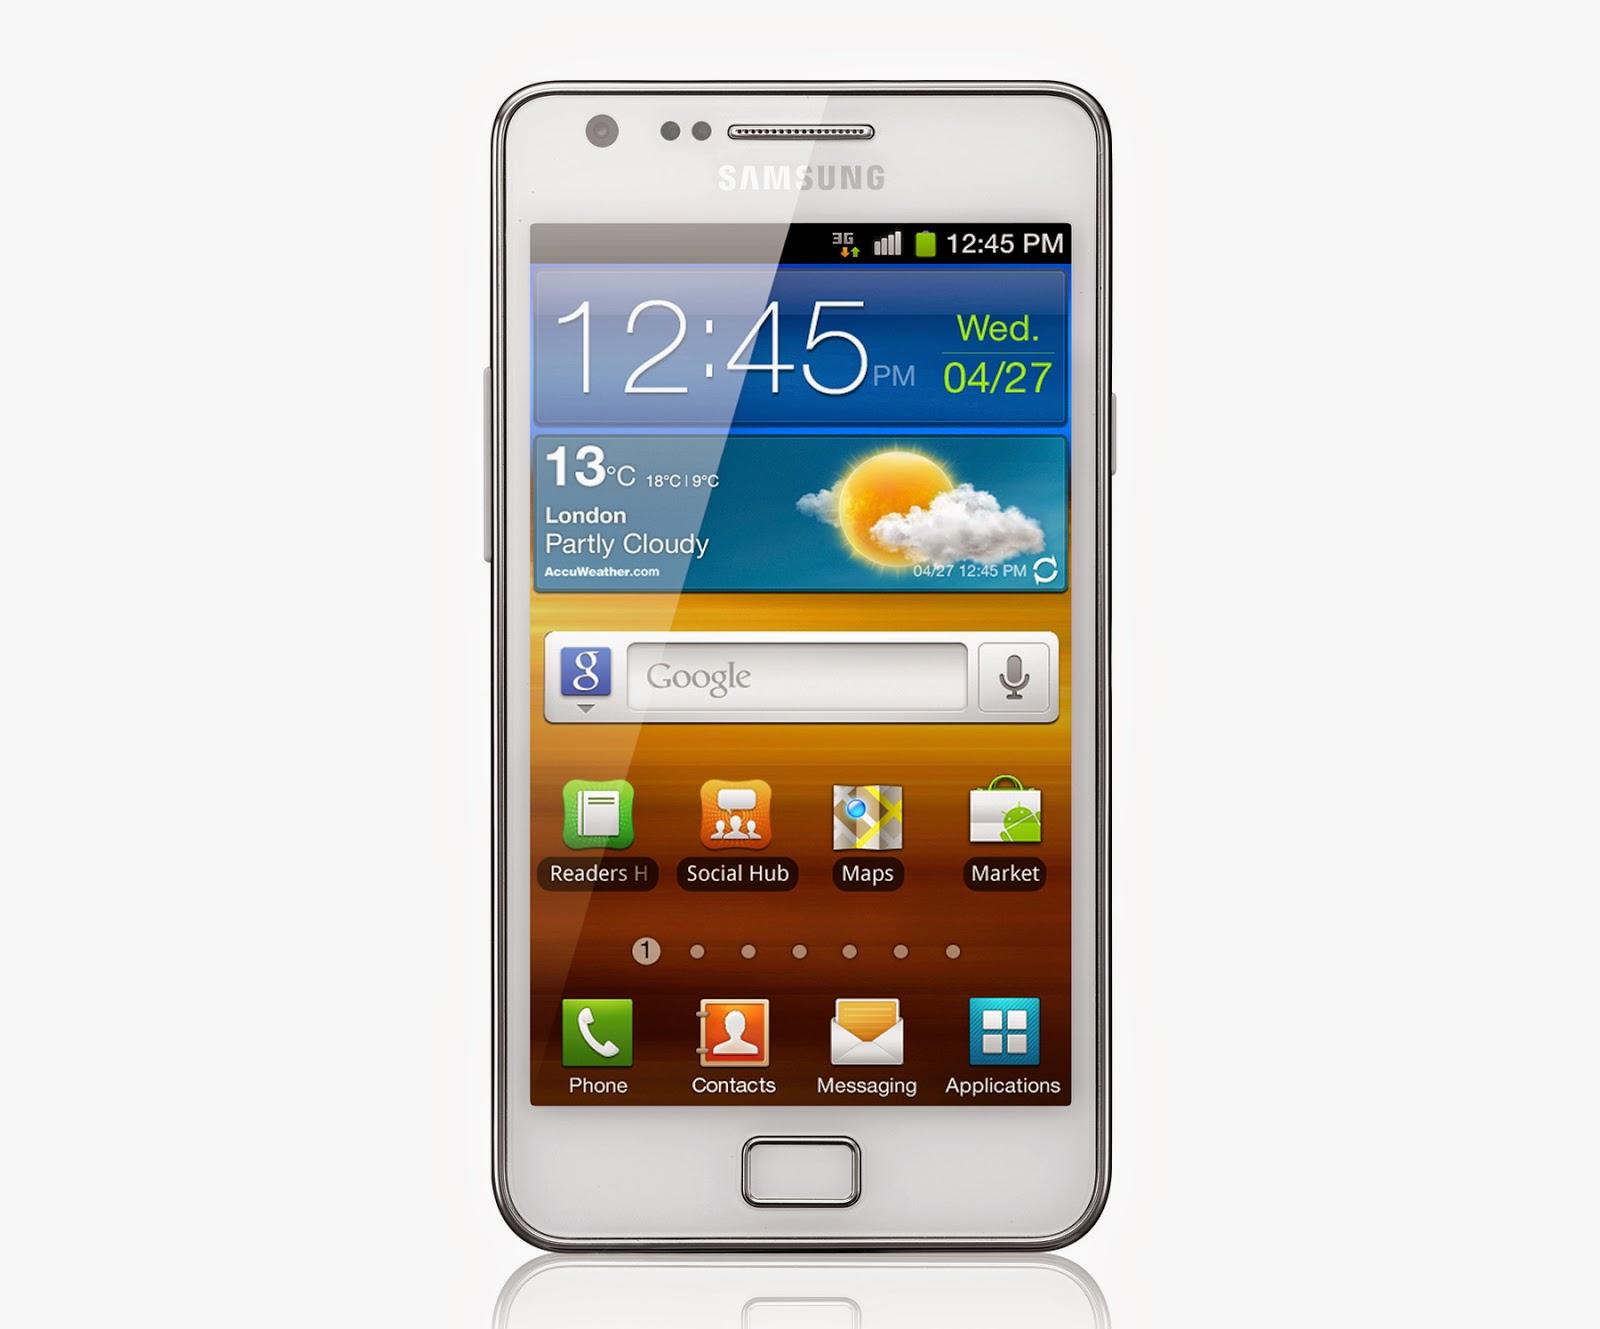 Como Resetar Samsung Galaxy S2 - Hard Reset